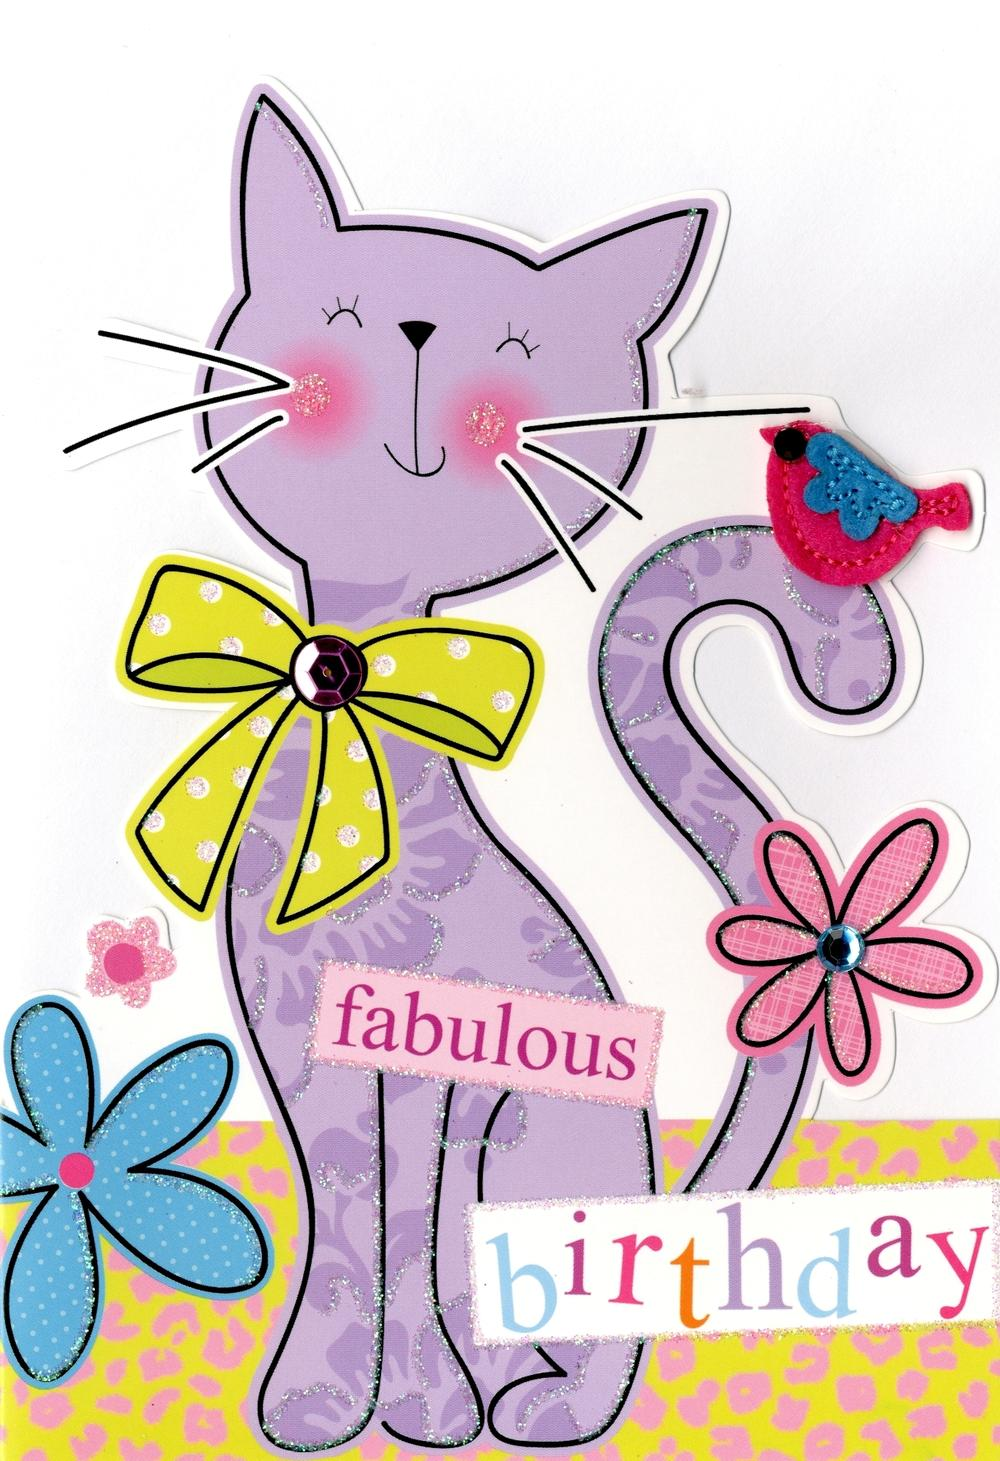 Cat Fabulous Birthday Greeting Card